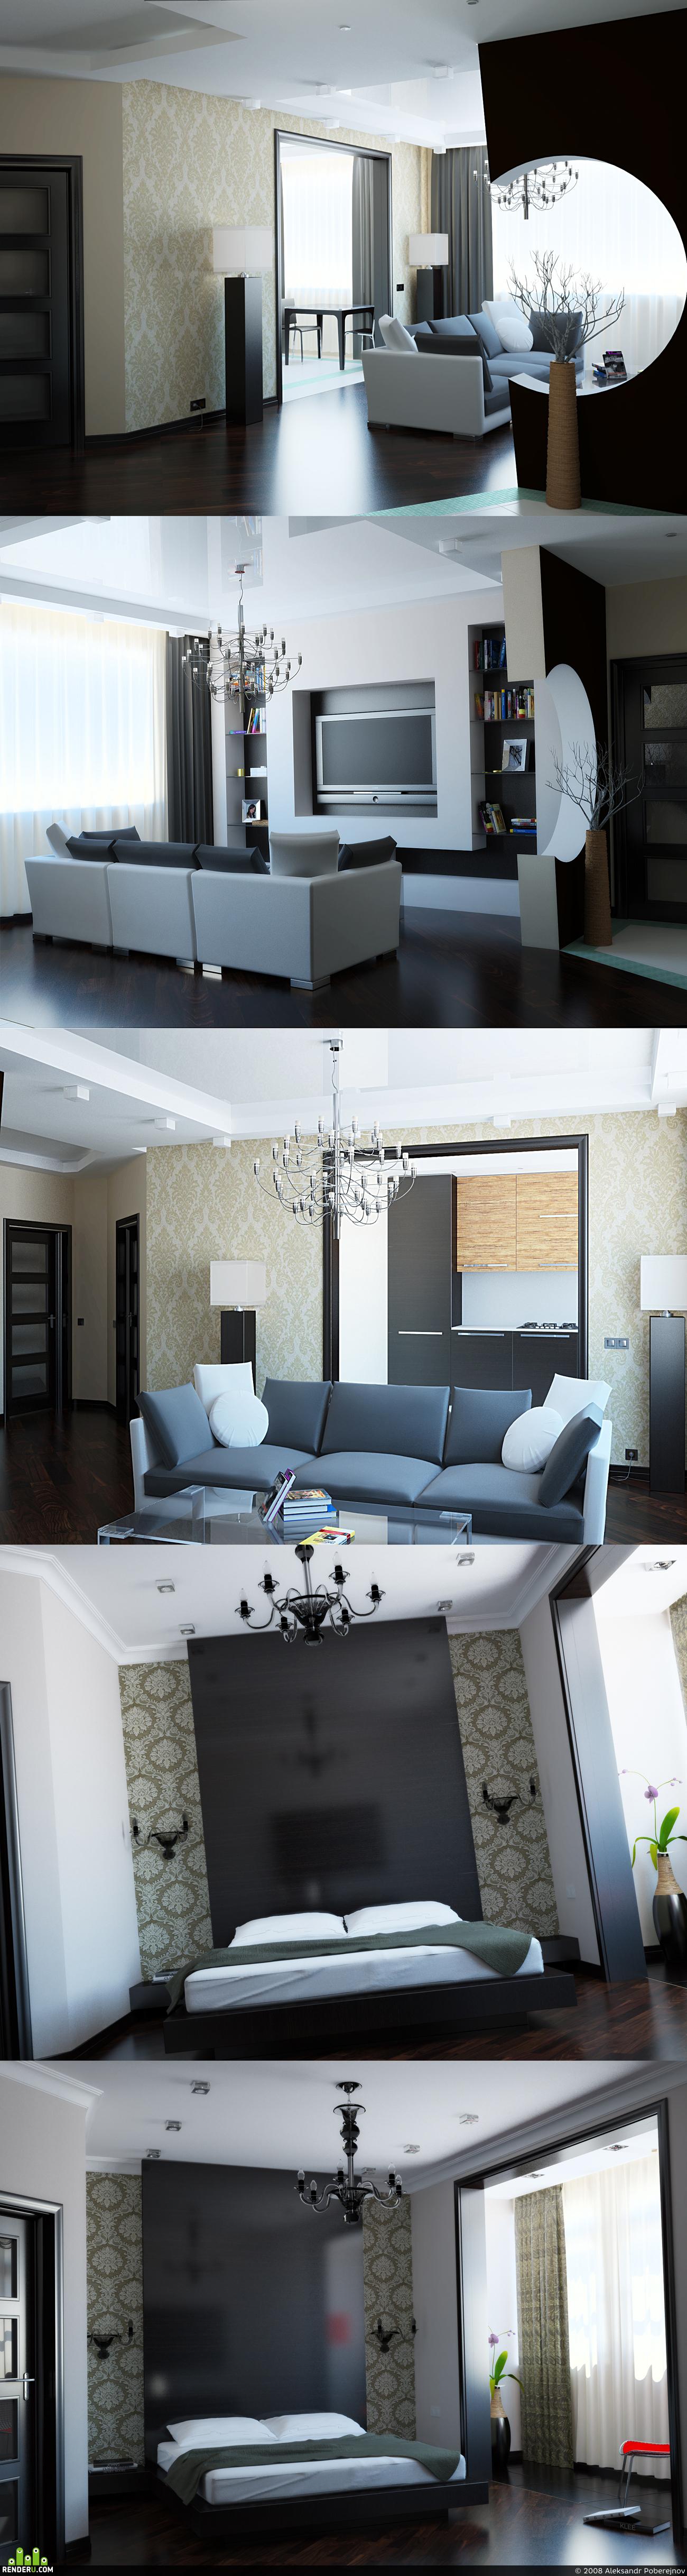 preview квартира в панельном доме